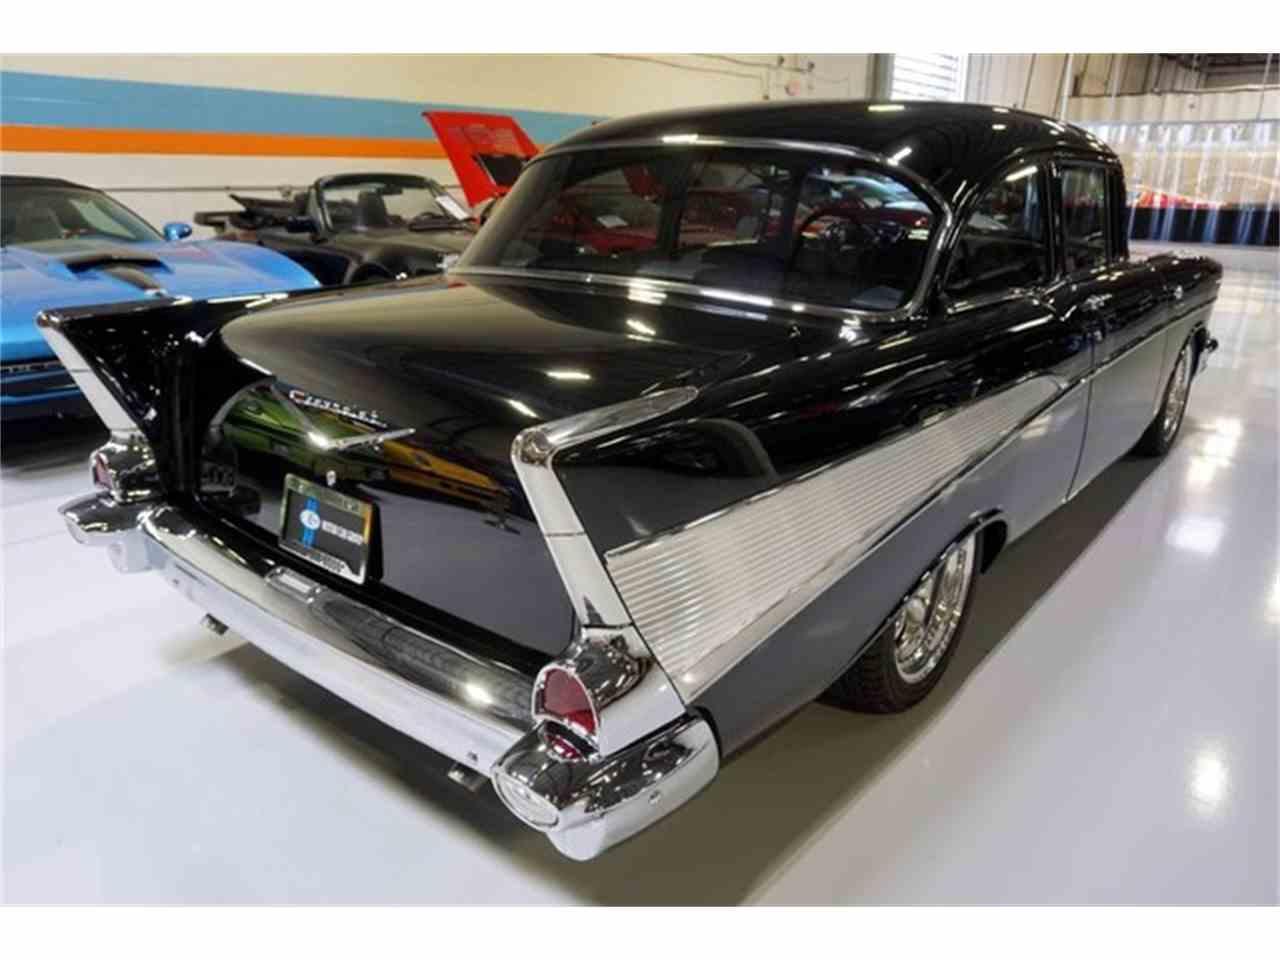 Resto Mod Cars For Sale: 1957 Chevrolet Resto-Mod For Sale